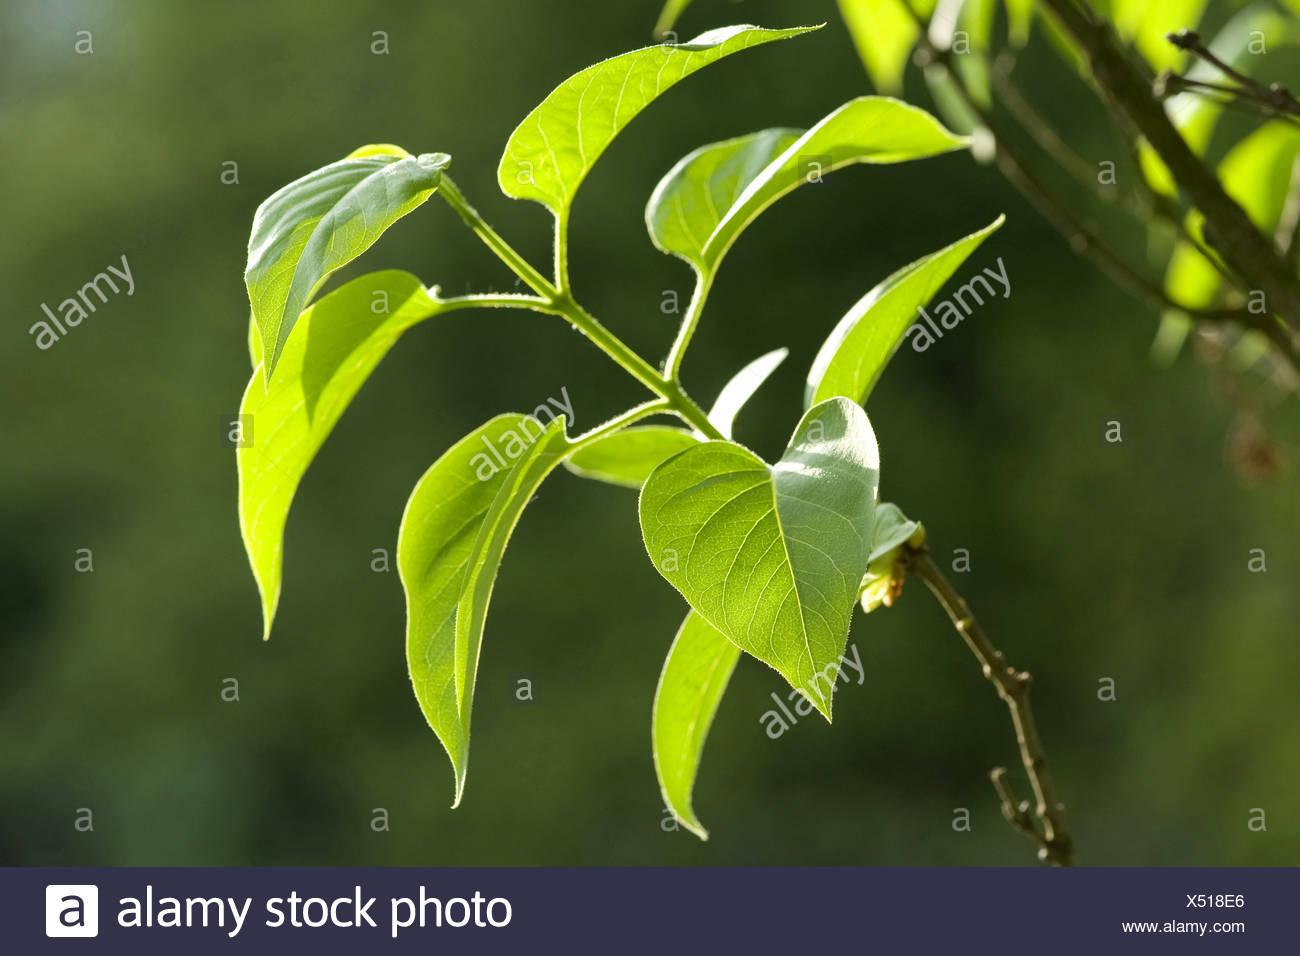 common lilac (Syringa vulgaris), twig with leaves, Germany - Stock Image